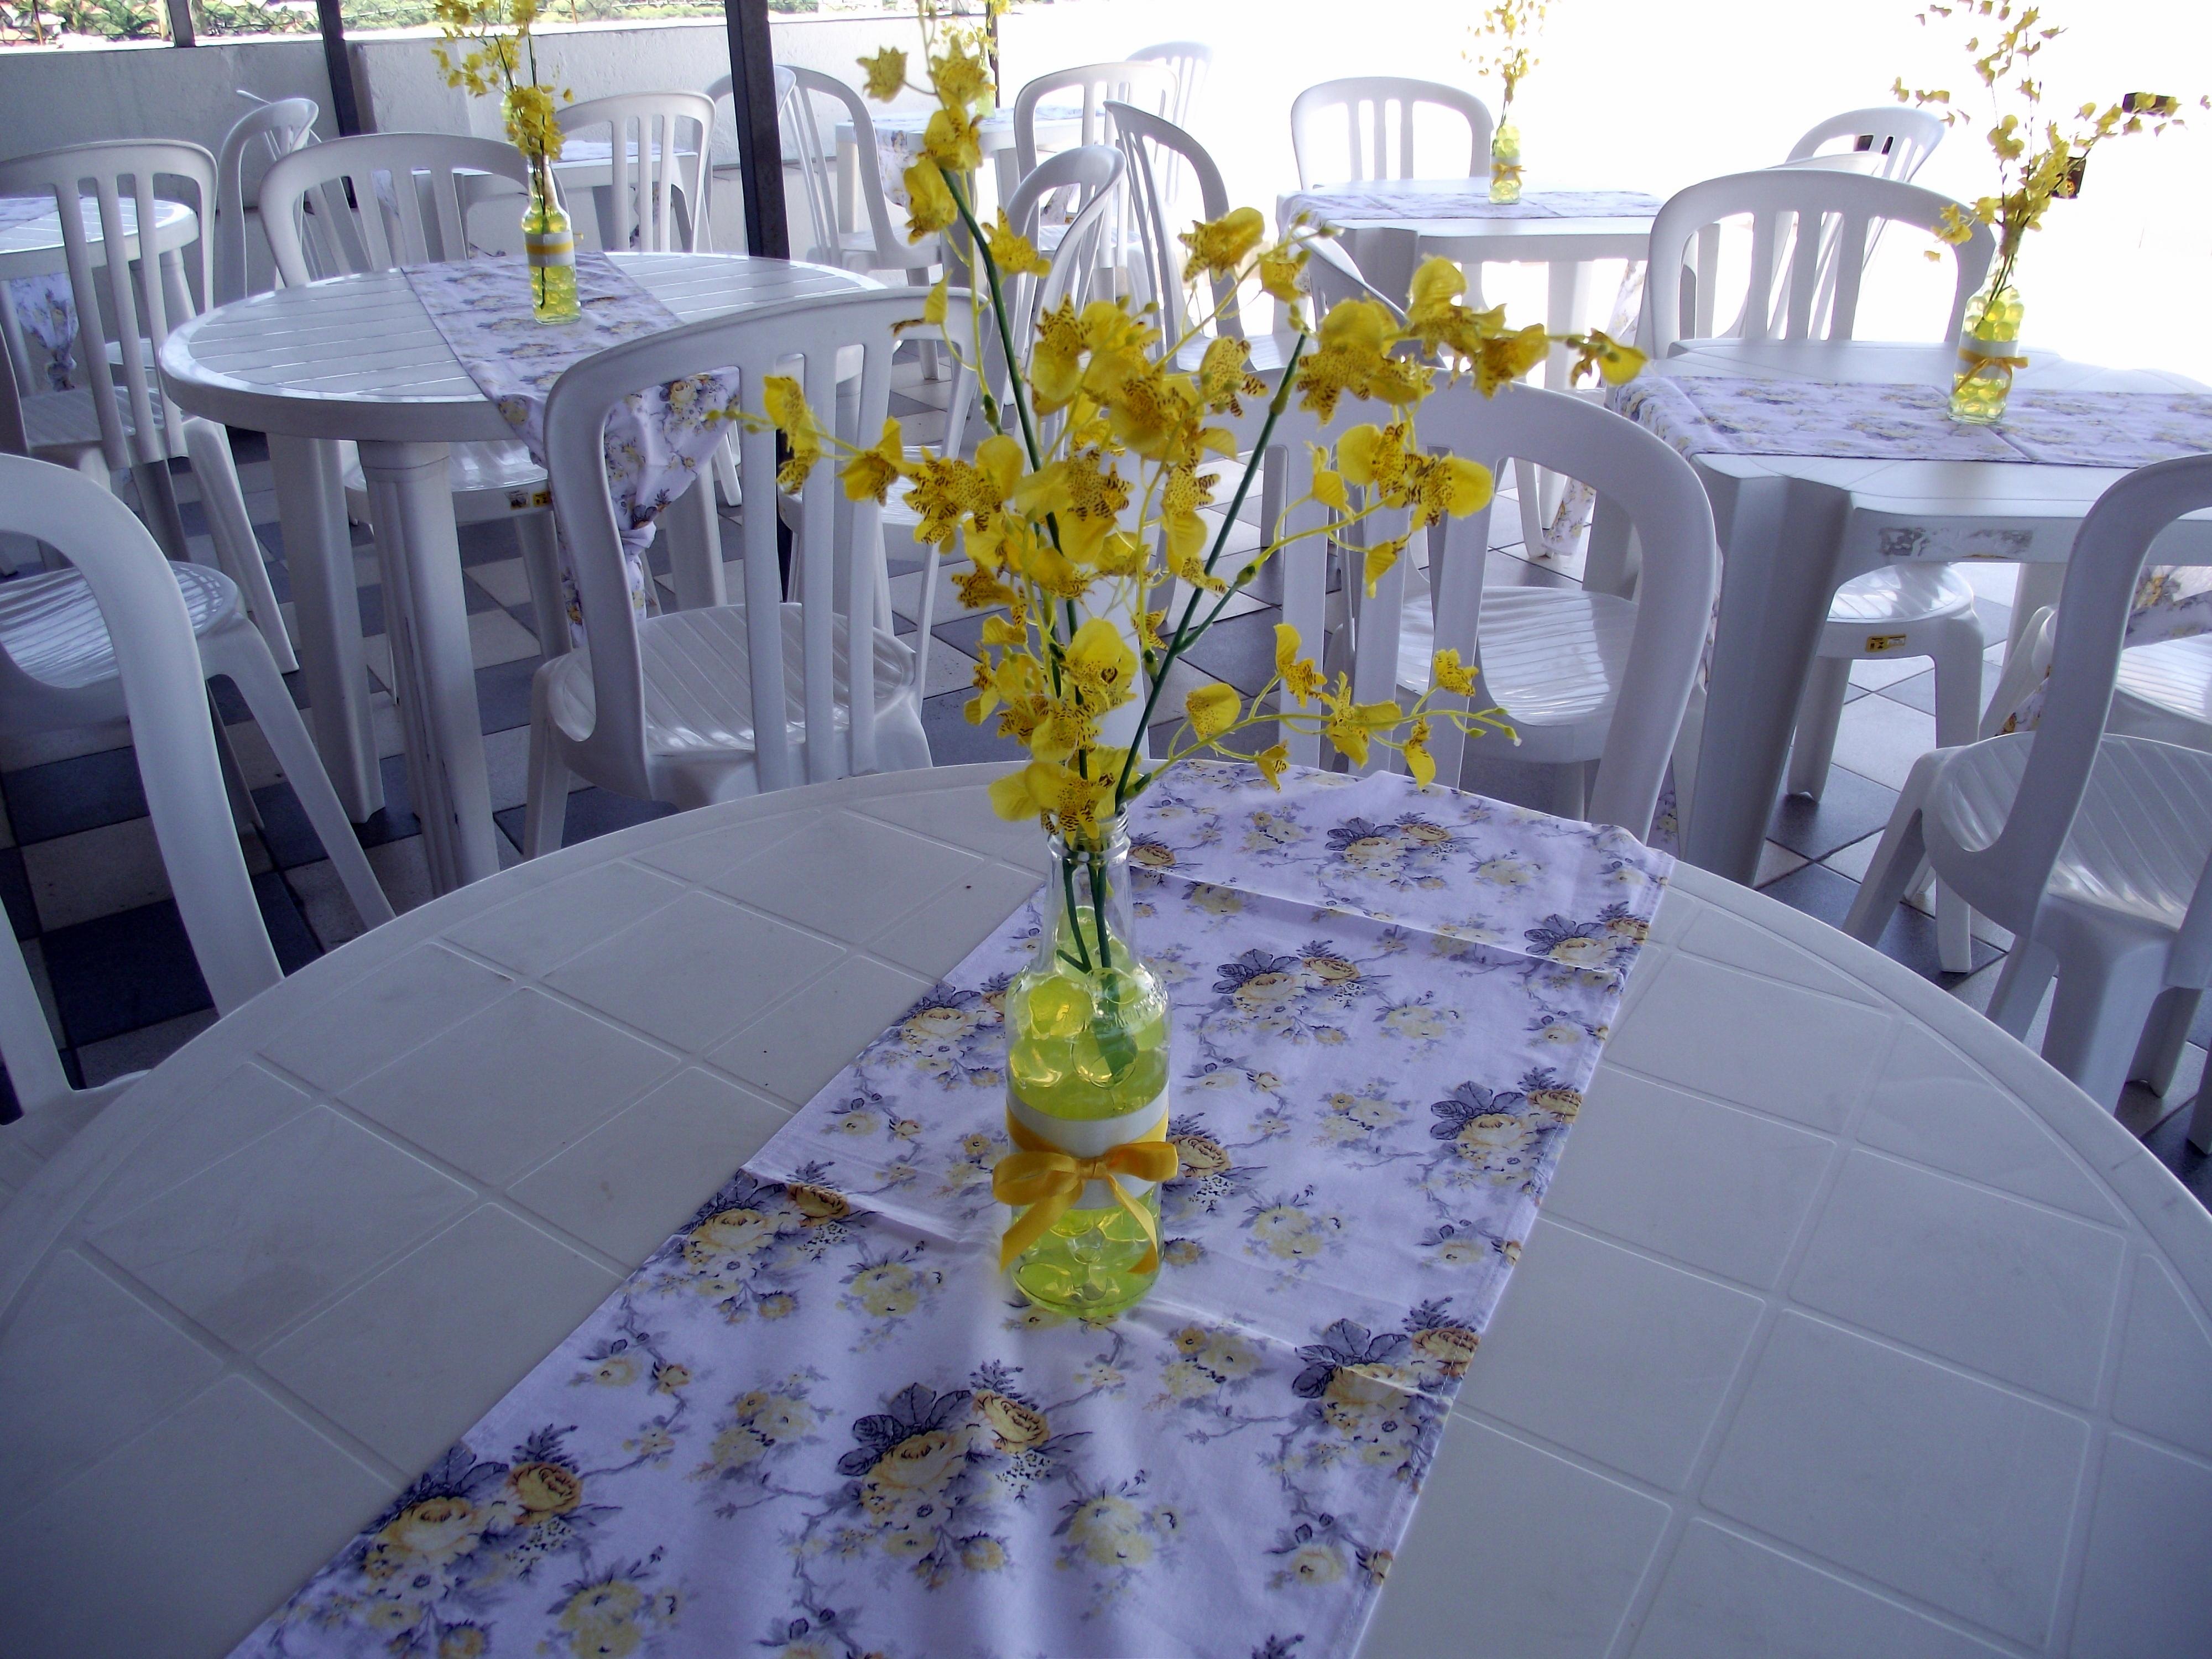 decoracao branca e amarela:Festa Amarela Decoração Festa Amarela Decoração Festa Amarela